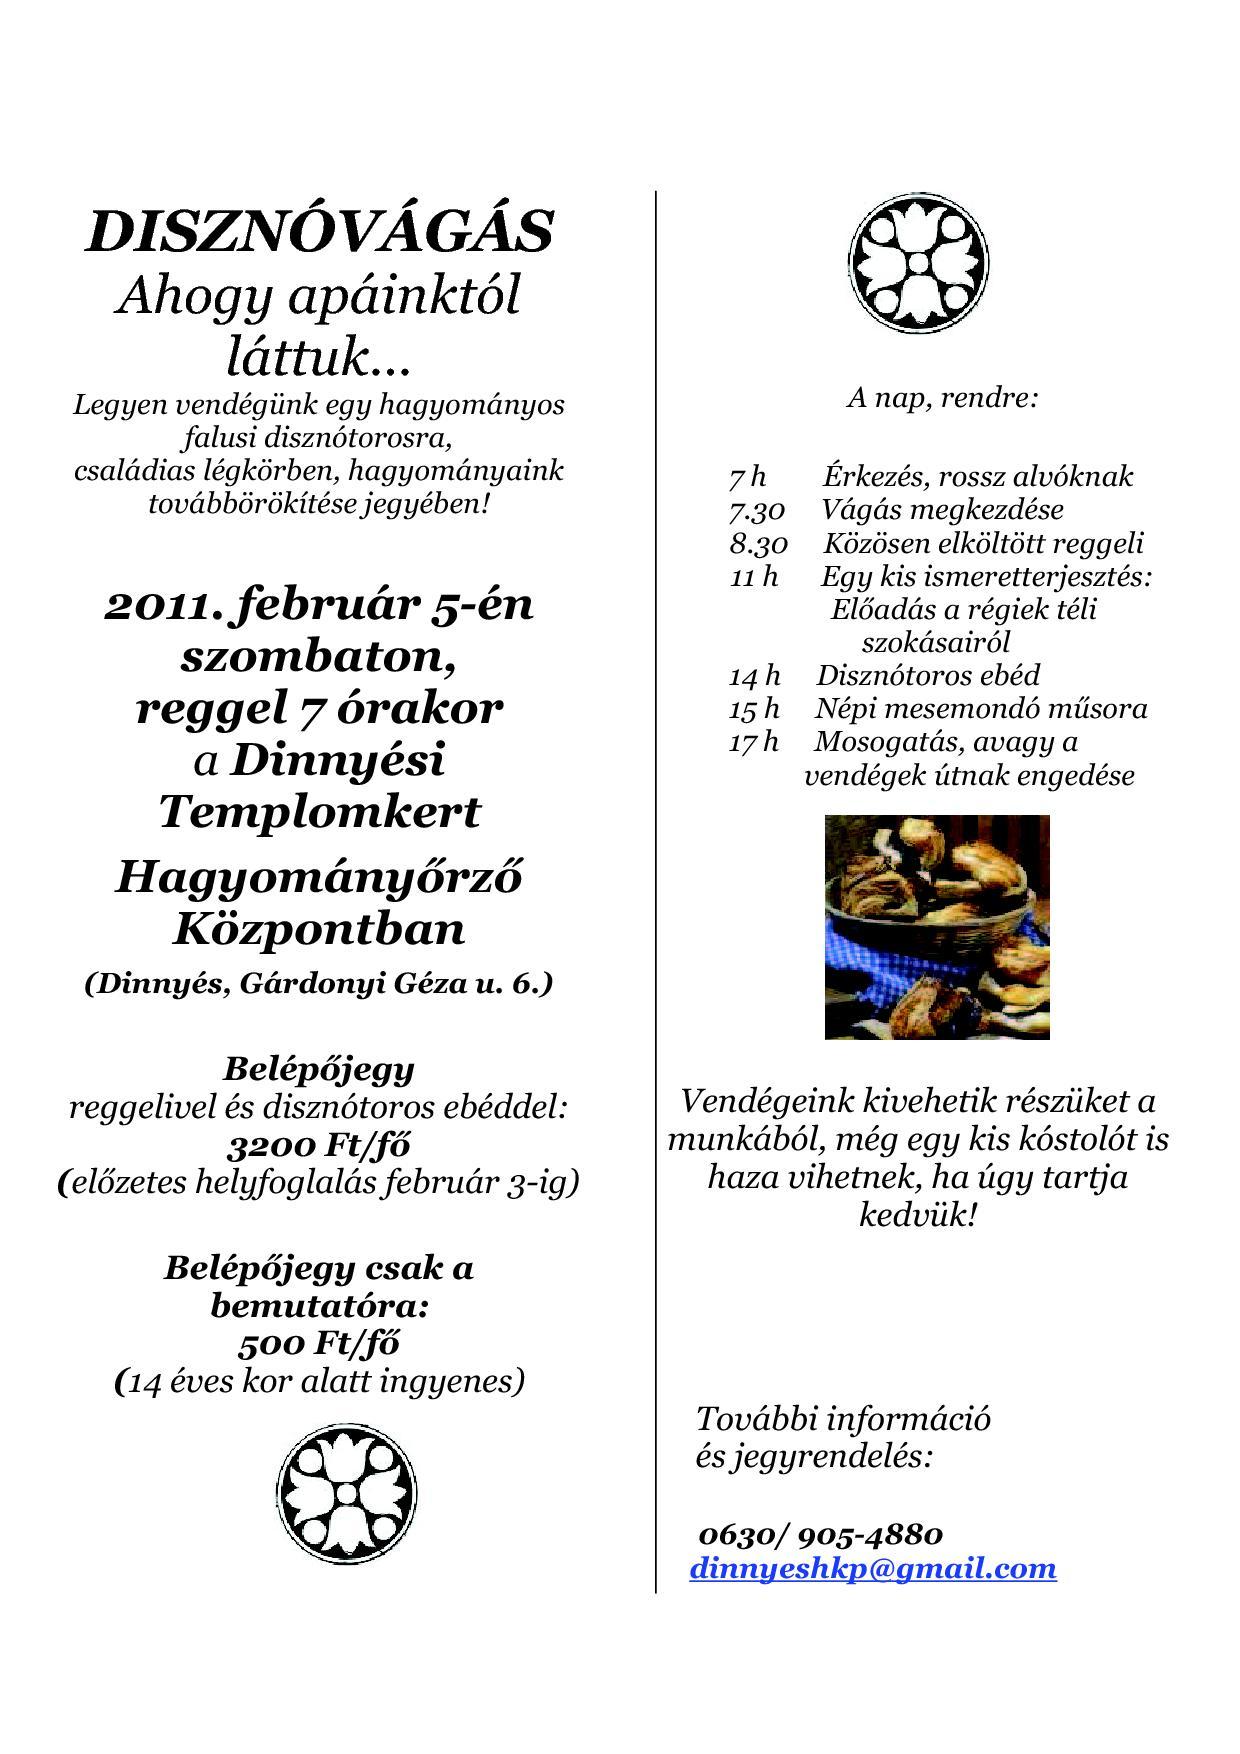 disznovagas.pdf